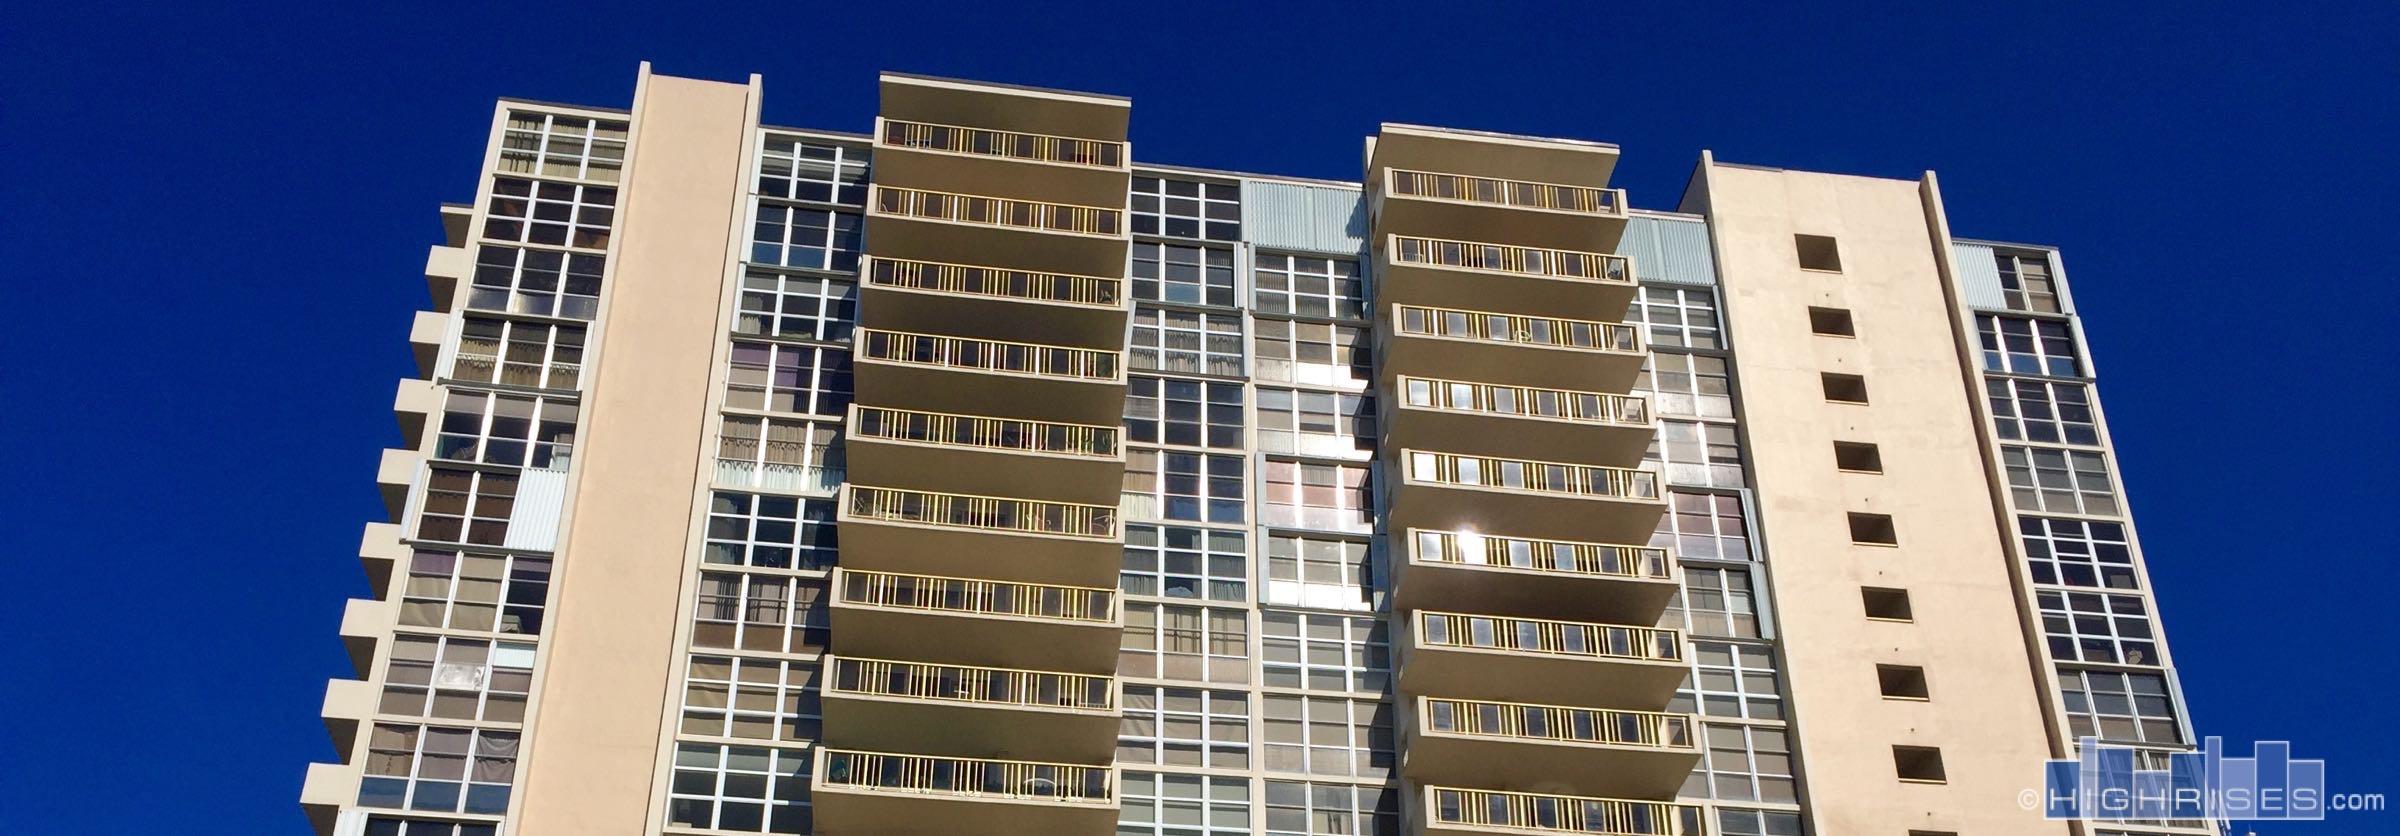 fort-lauderdale-embassy-towers_banner.jpg